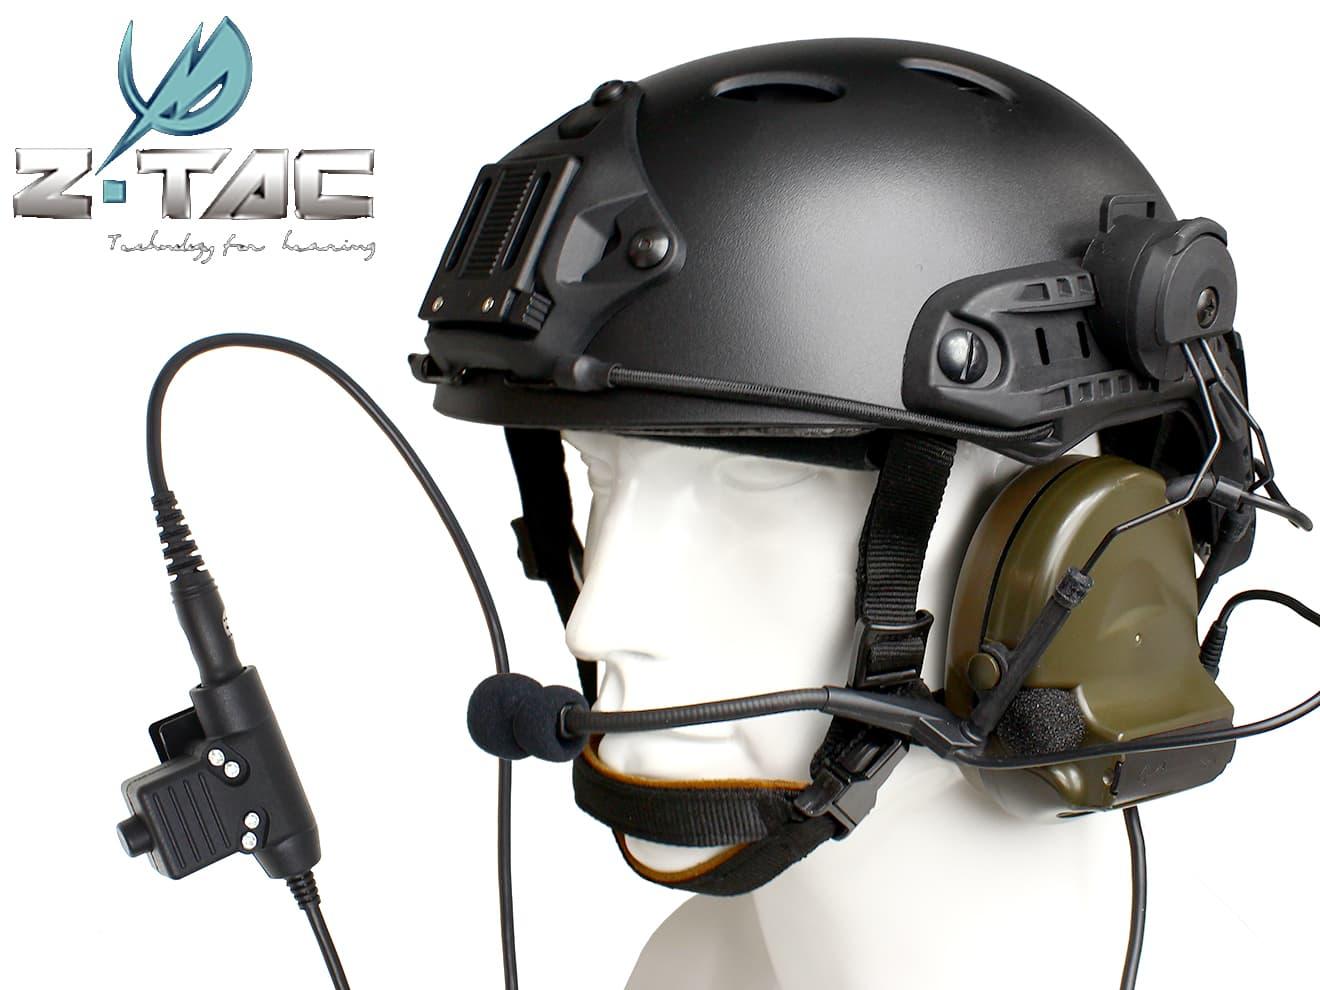 Z-TACTICAL COMTAC2ヘッドセット+U94タイプPTT(ICOM用)+OPS CORE CARBONEタイプ ヘルメット+ARCレールアダプター BK◆嬉しい4点セット!超オトク価格でご提供!